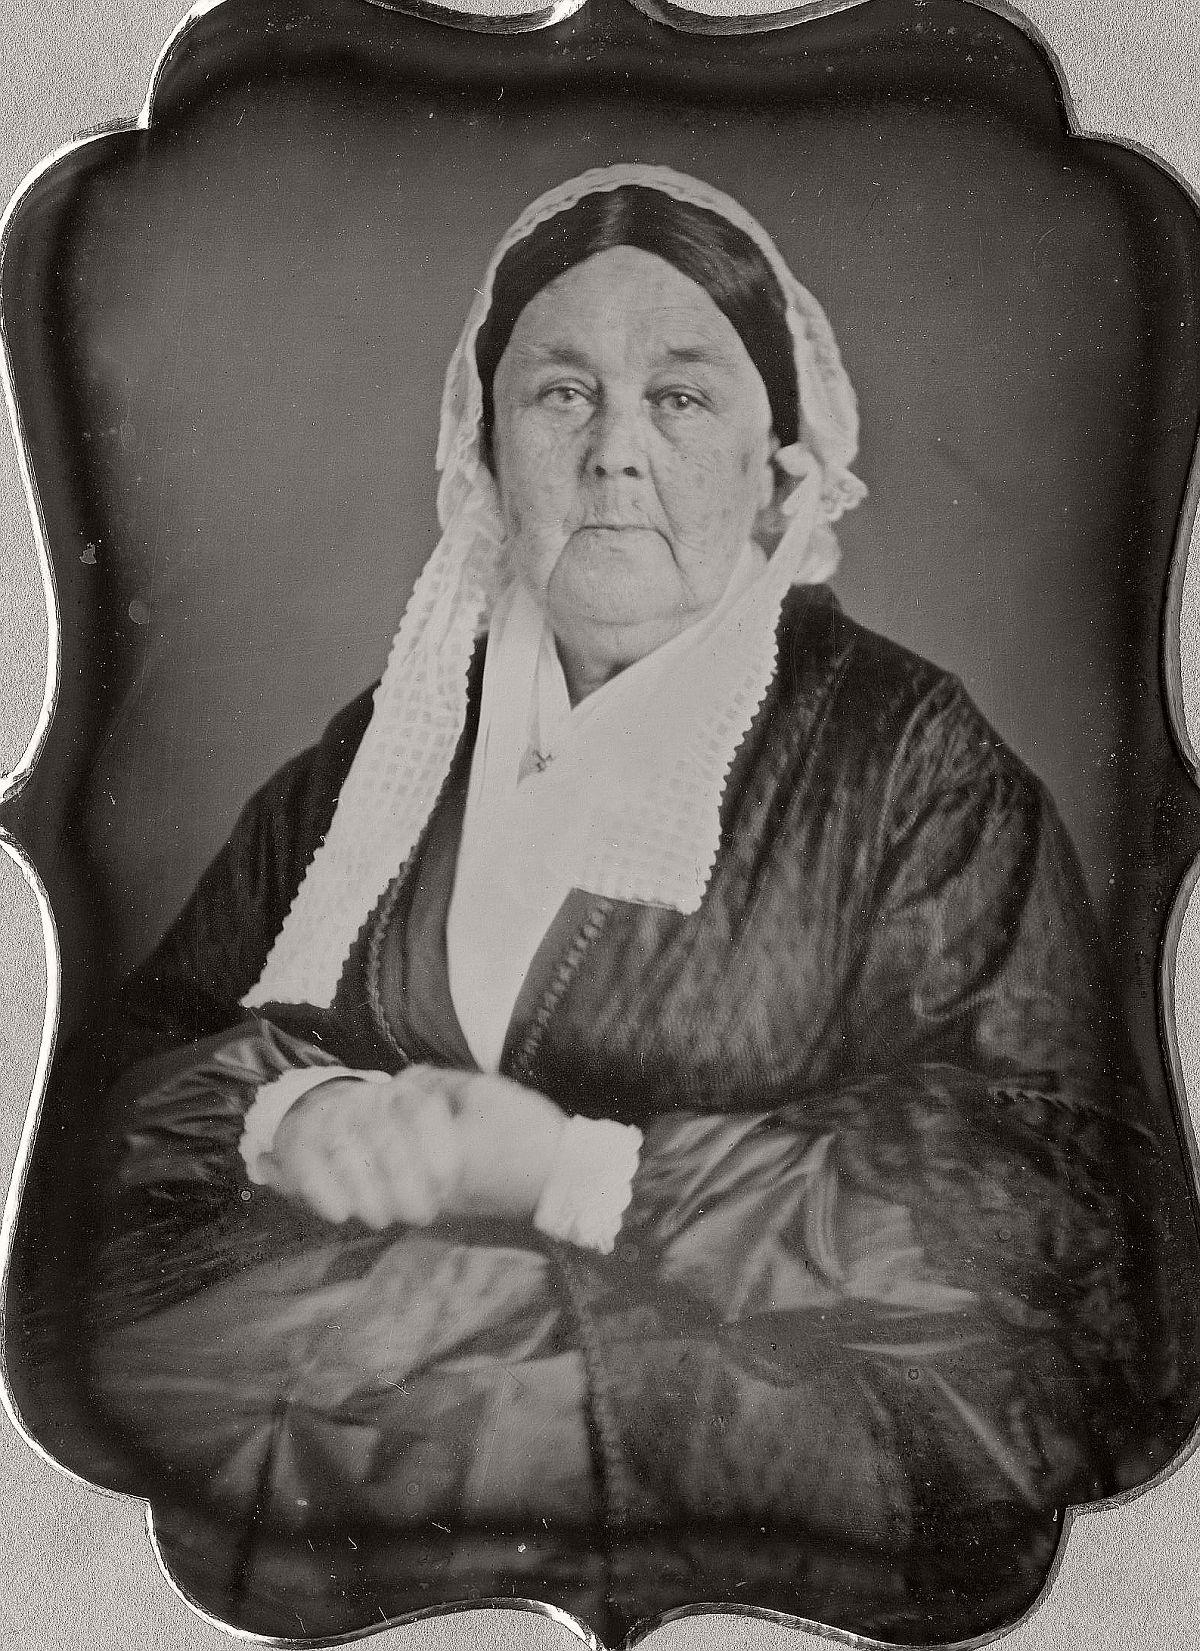 daguerreotype-portrait-ladies-born-in-the-late-18th-century-1700s-vintage-11